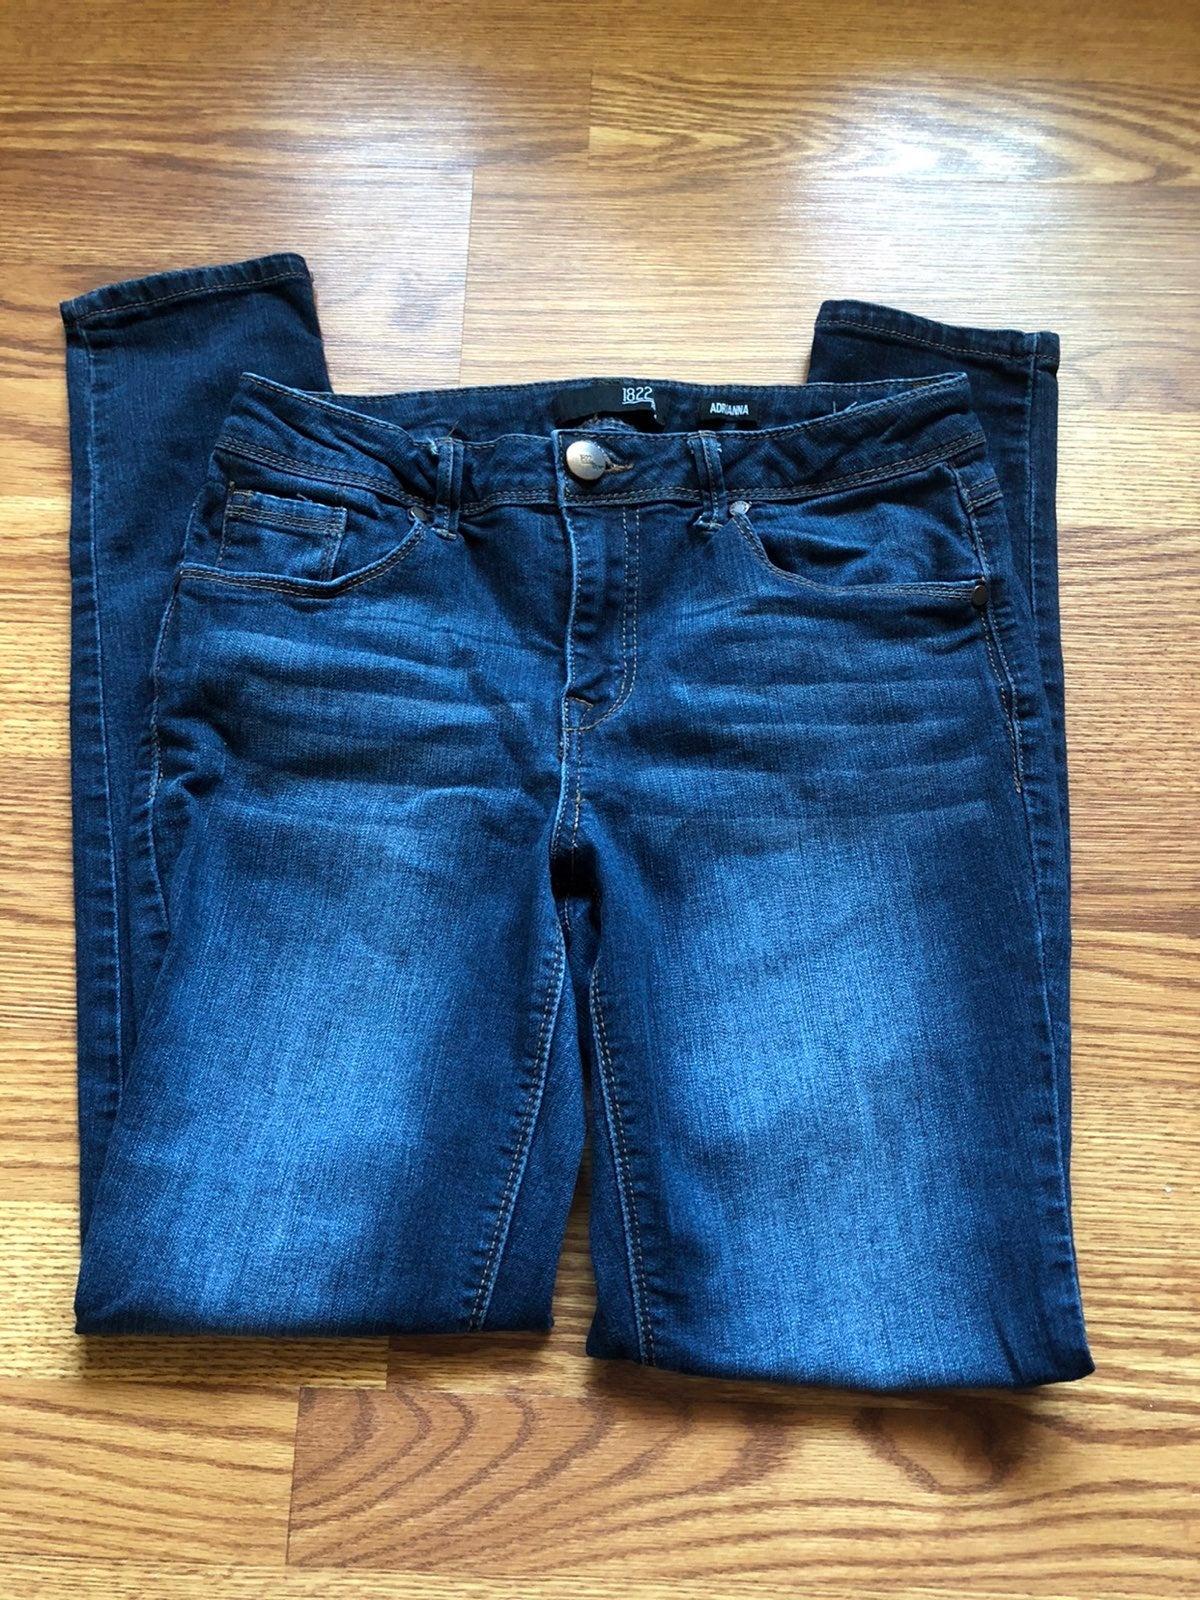 1822 Adrianna jeans